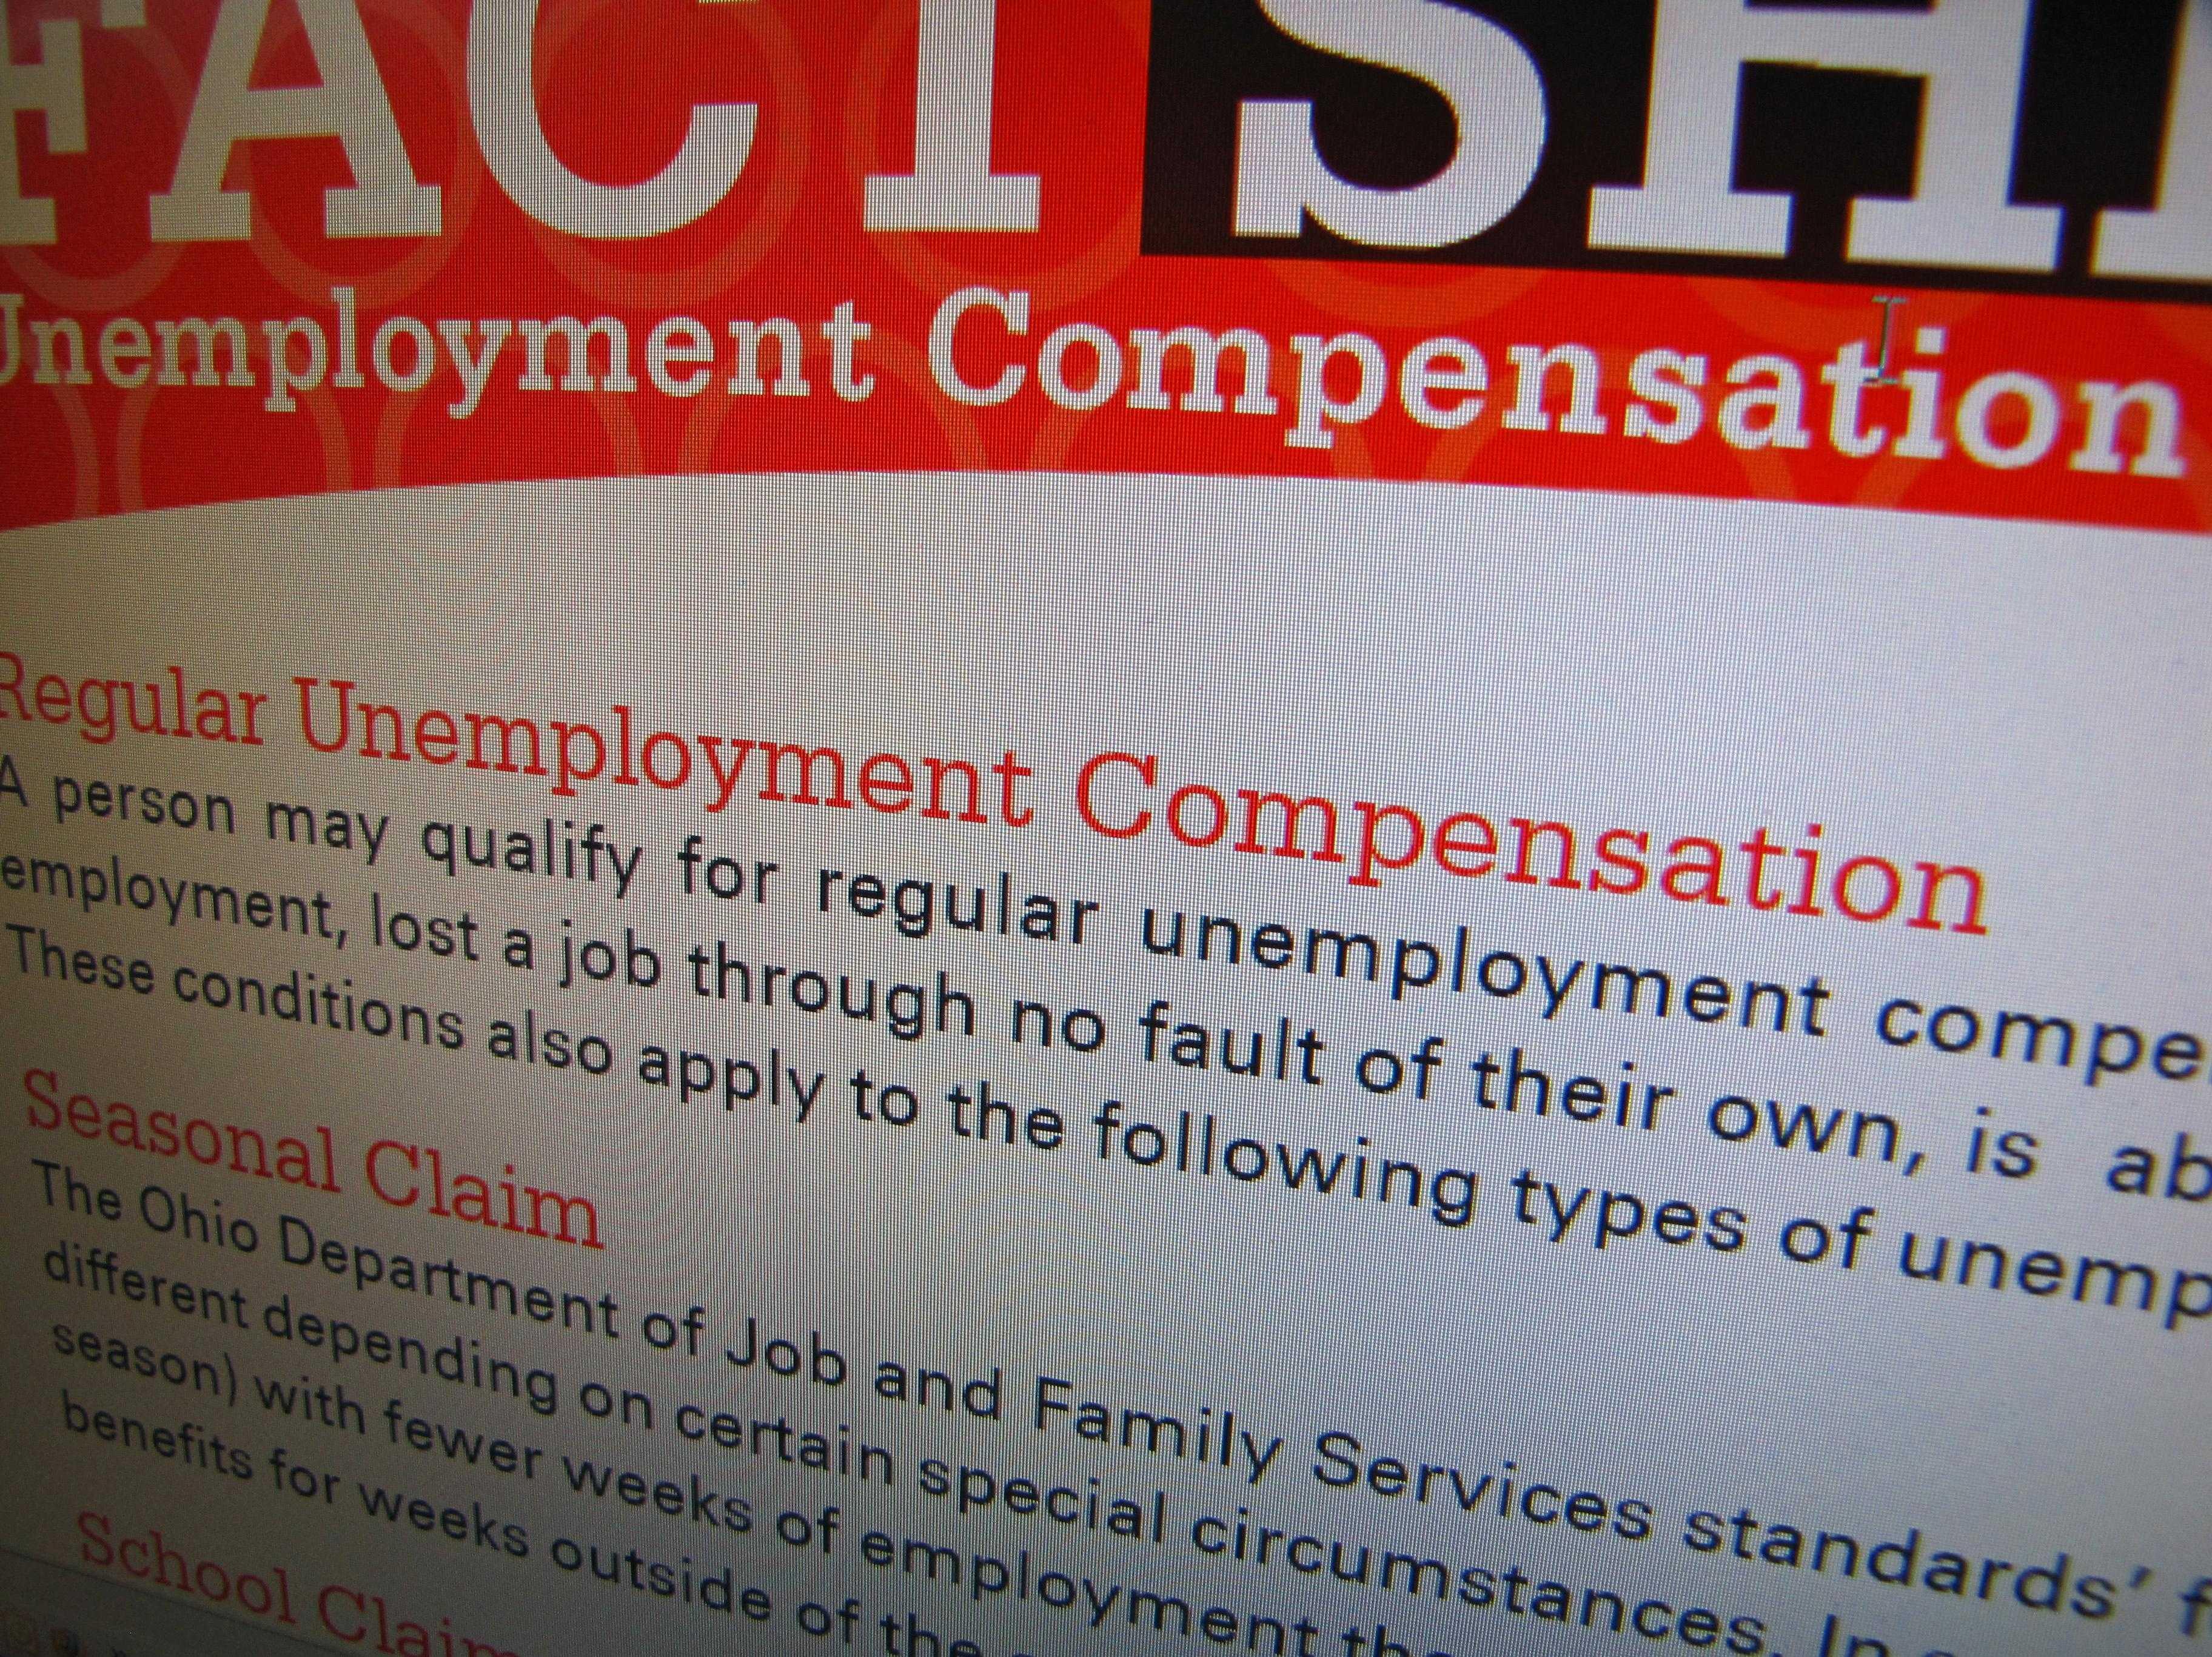 Ohio unemployment generic (not great) - 22751336